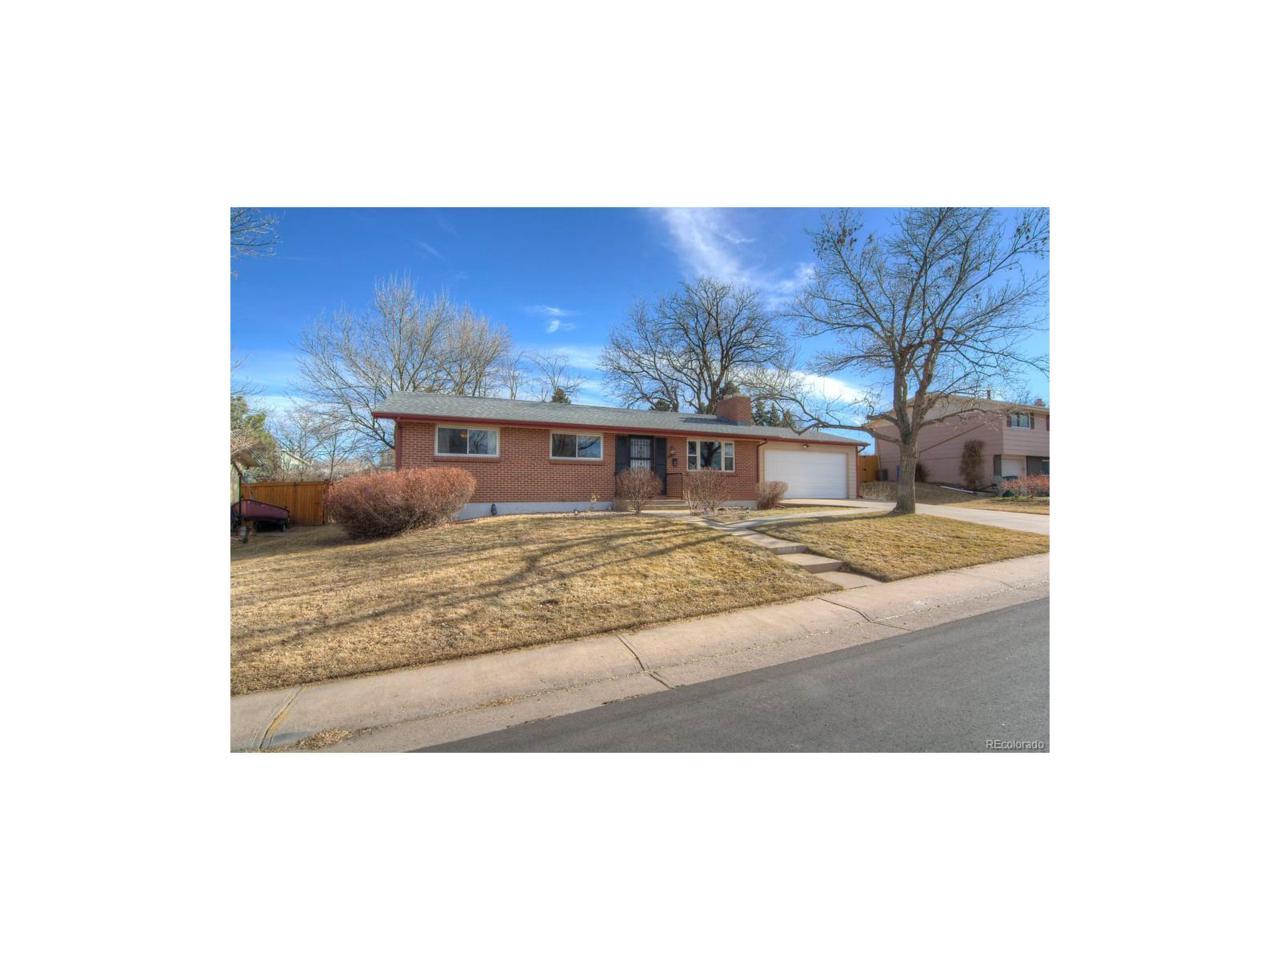 6844 S Cherry Street, Centennial, CO 80122 (#5163326) :: The Peak Properties Group